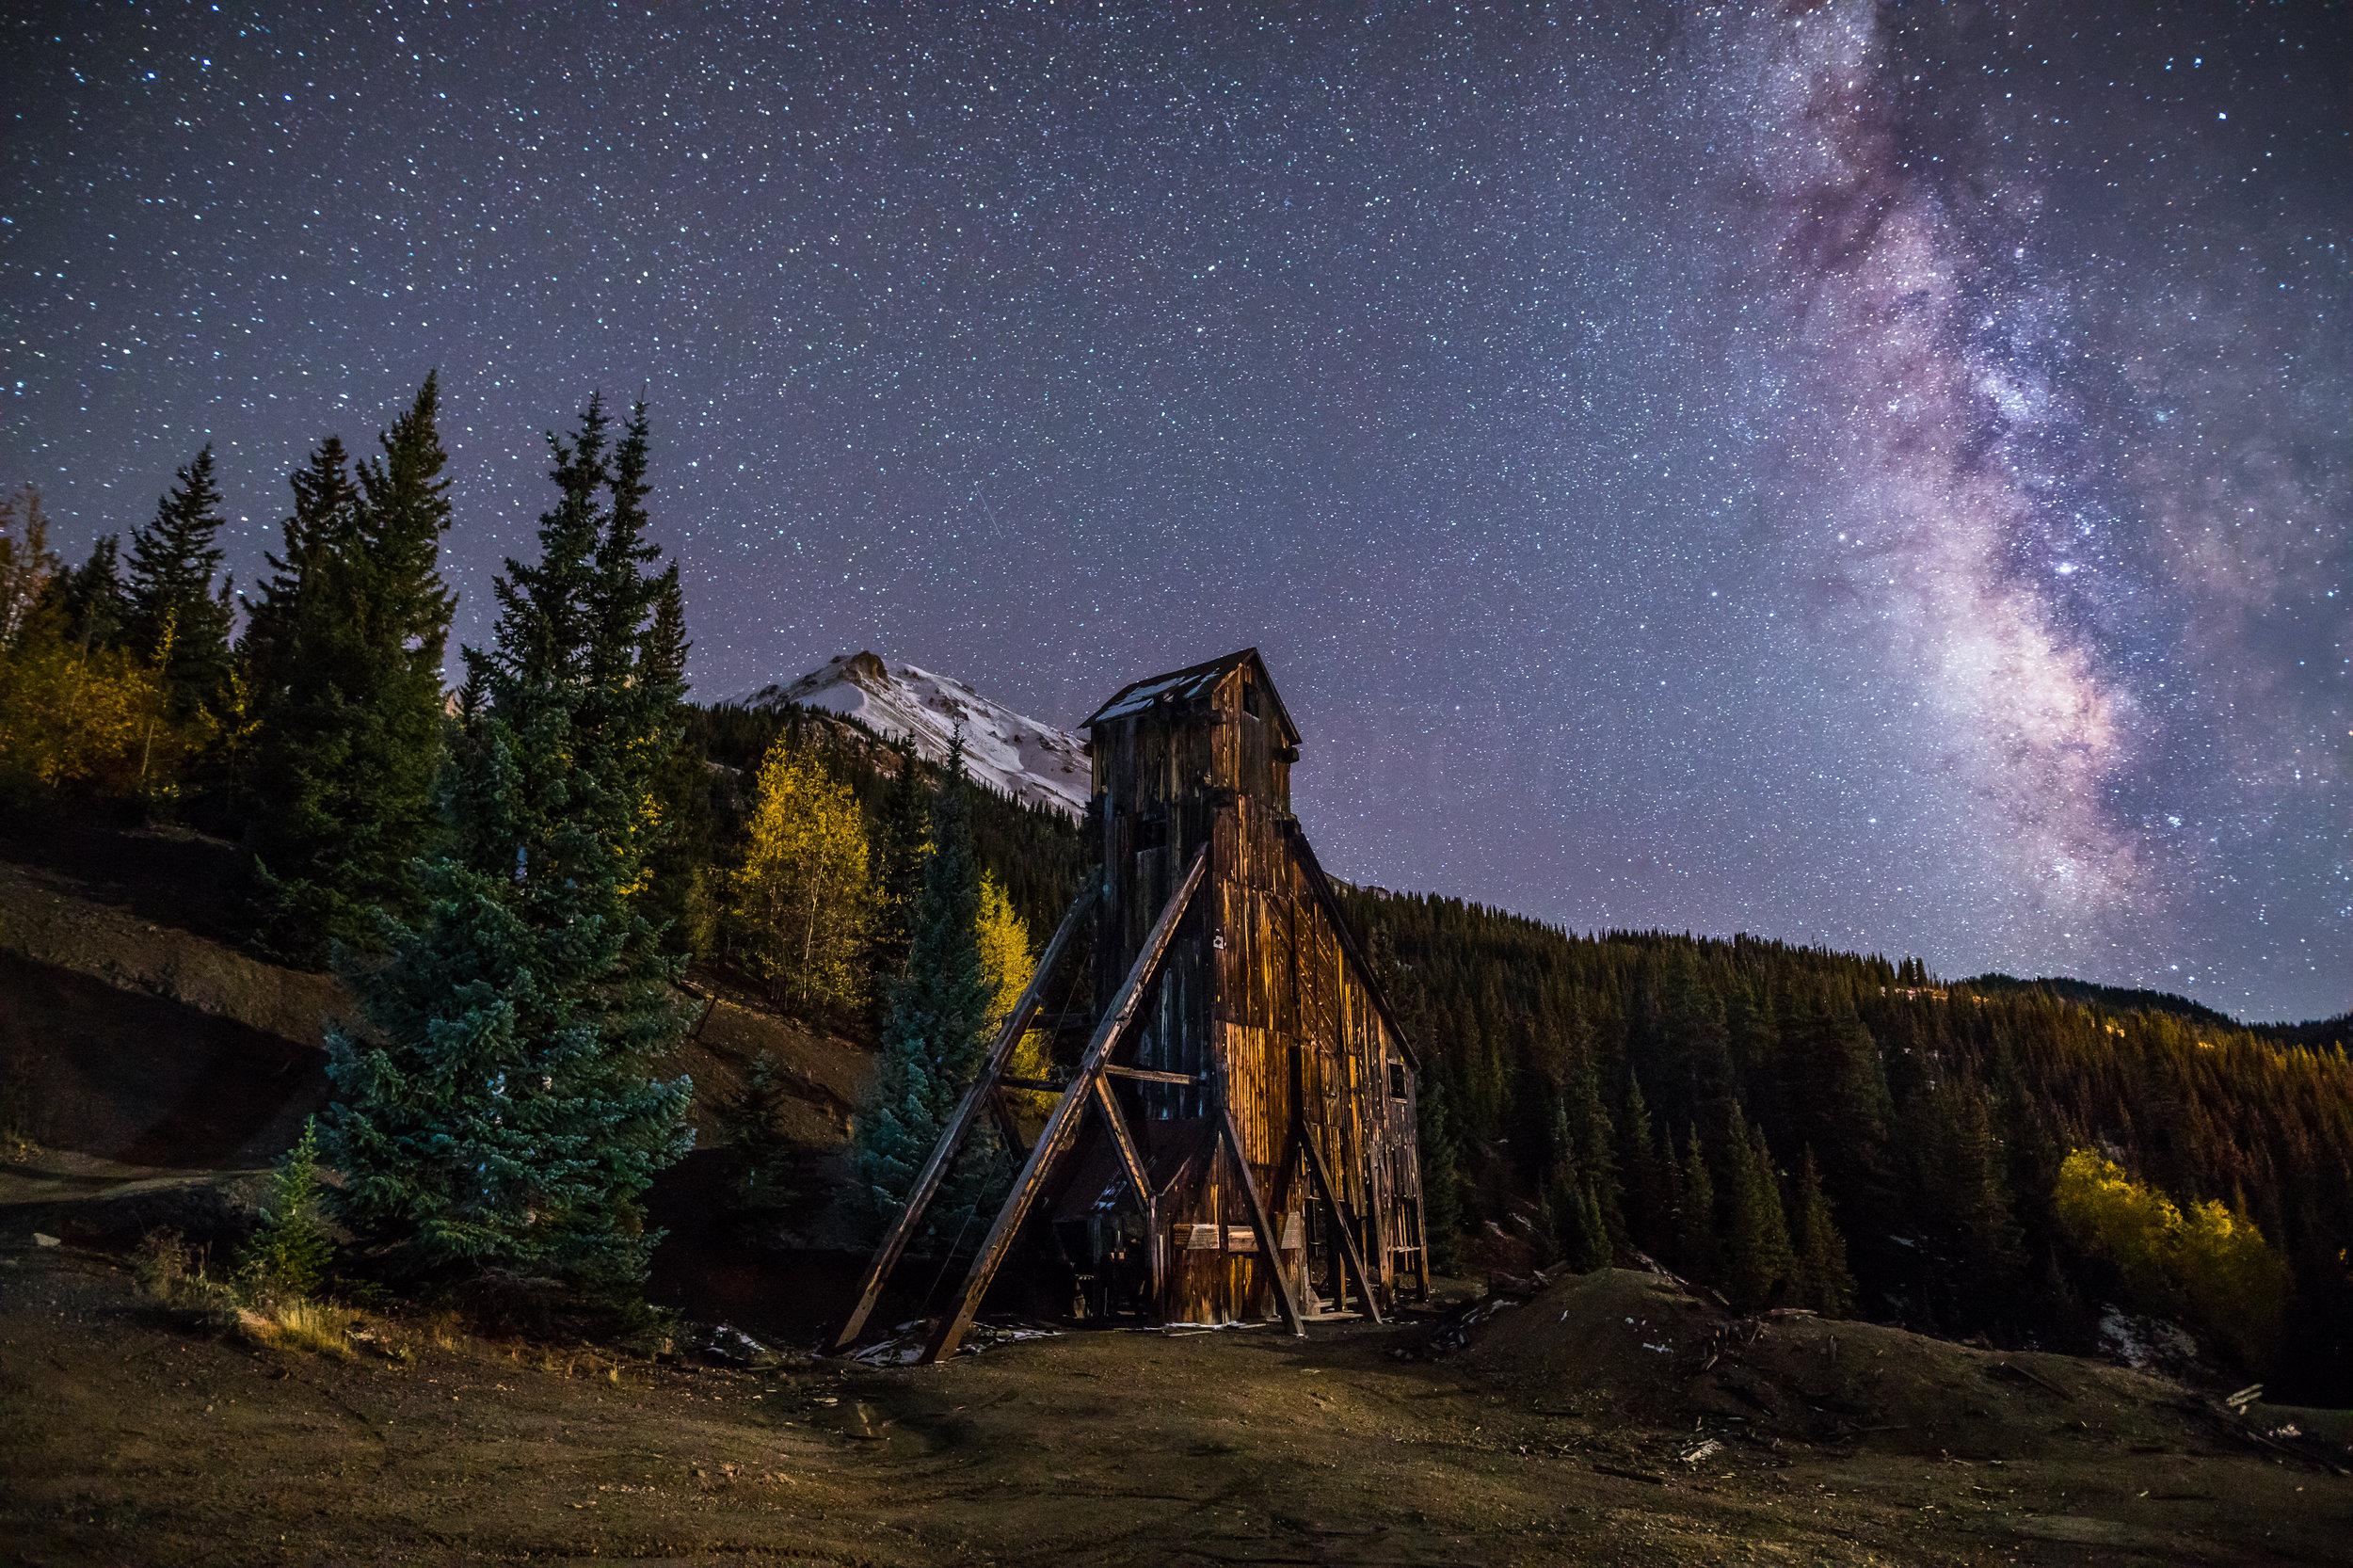 Milky way over Yankee Girl Mine, Image # 5473